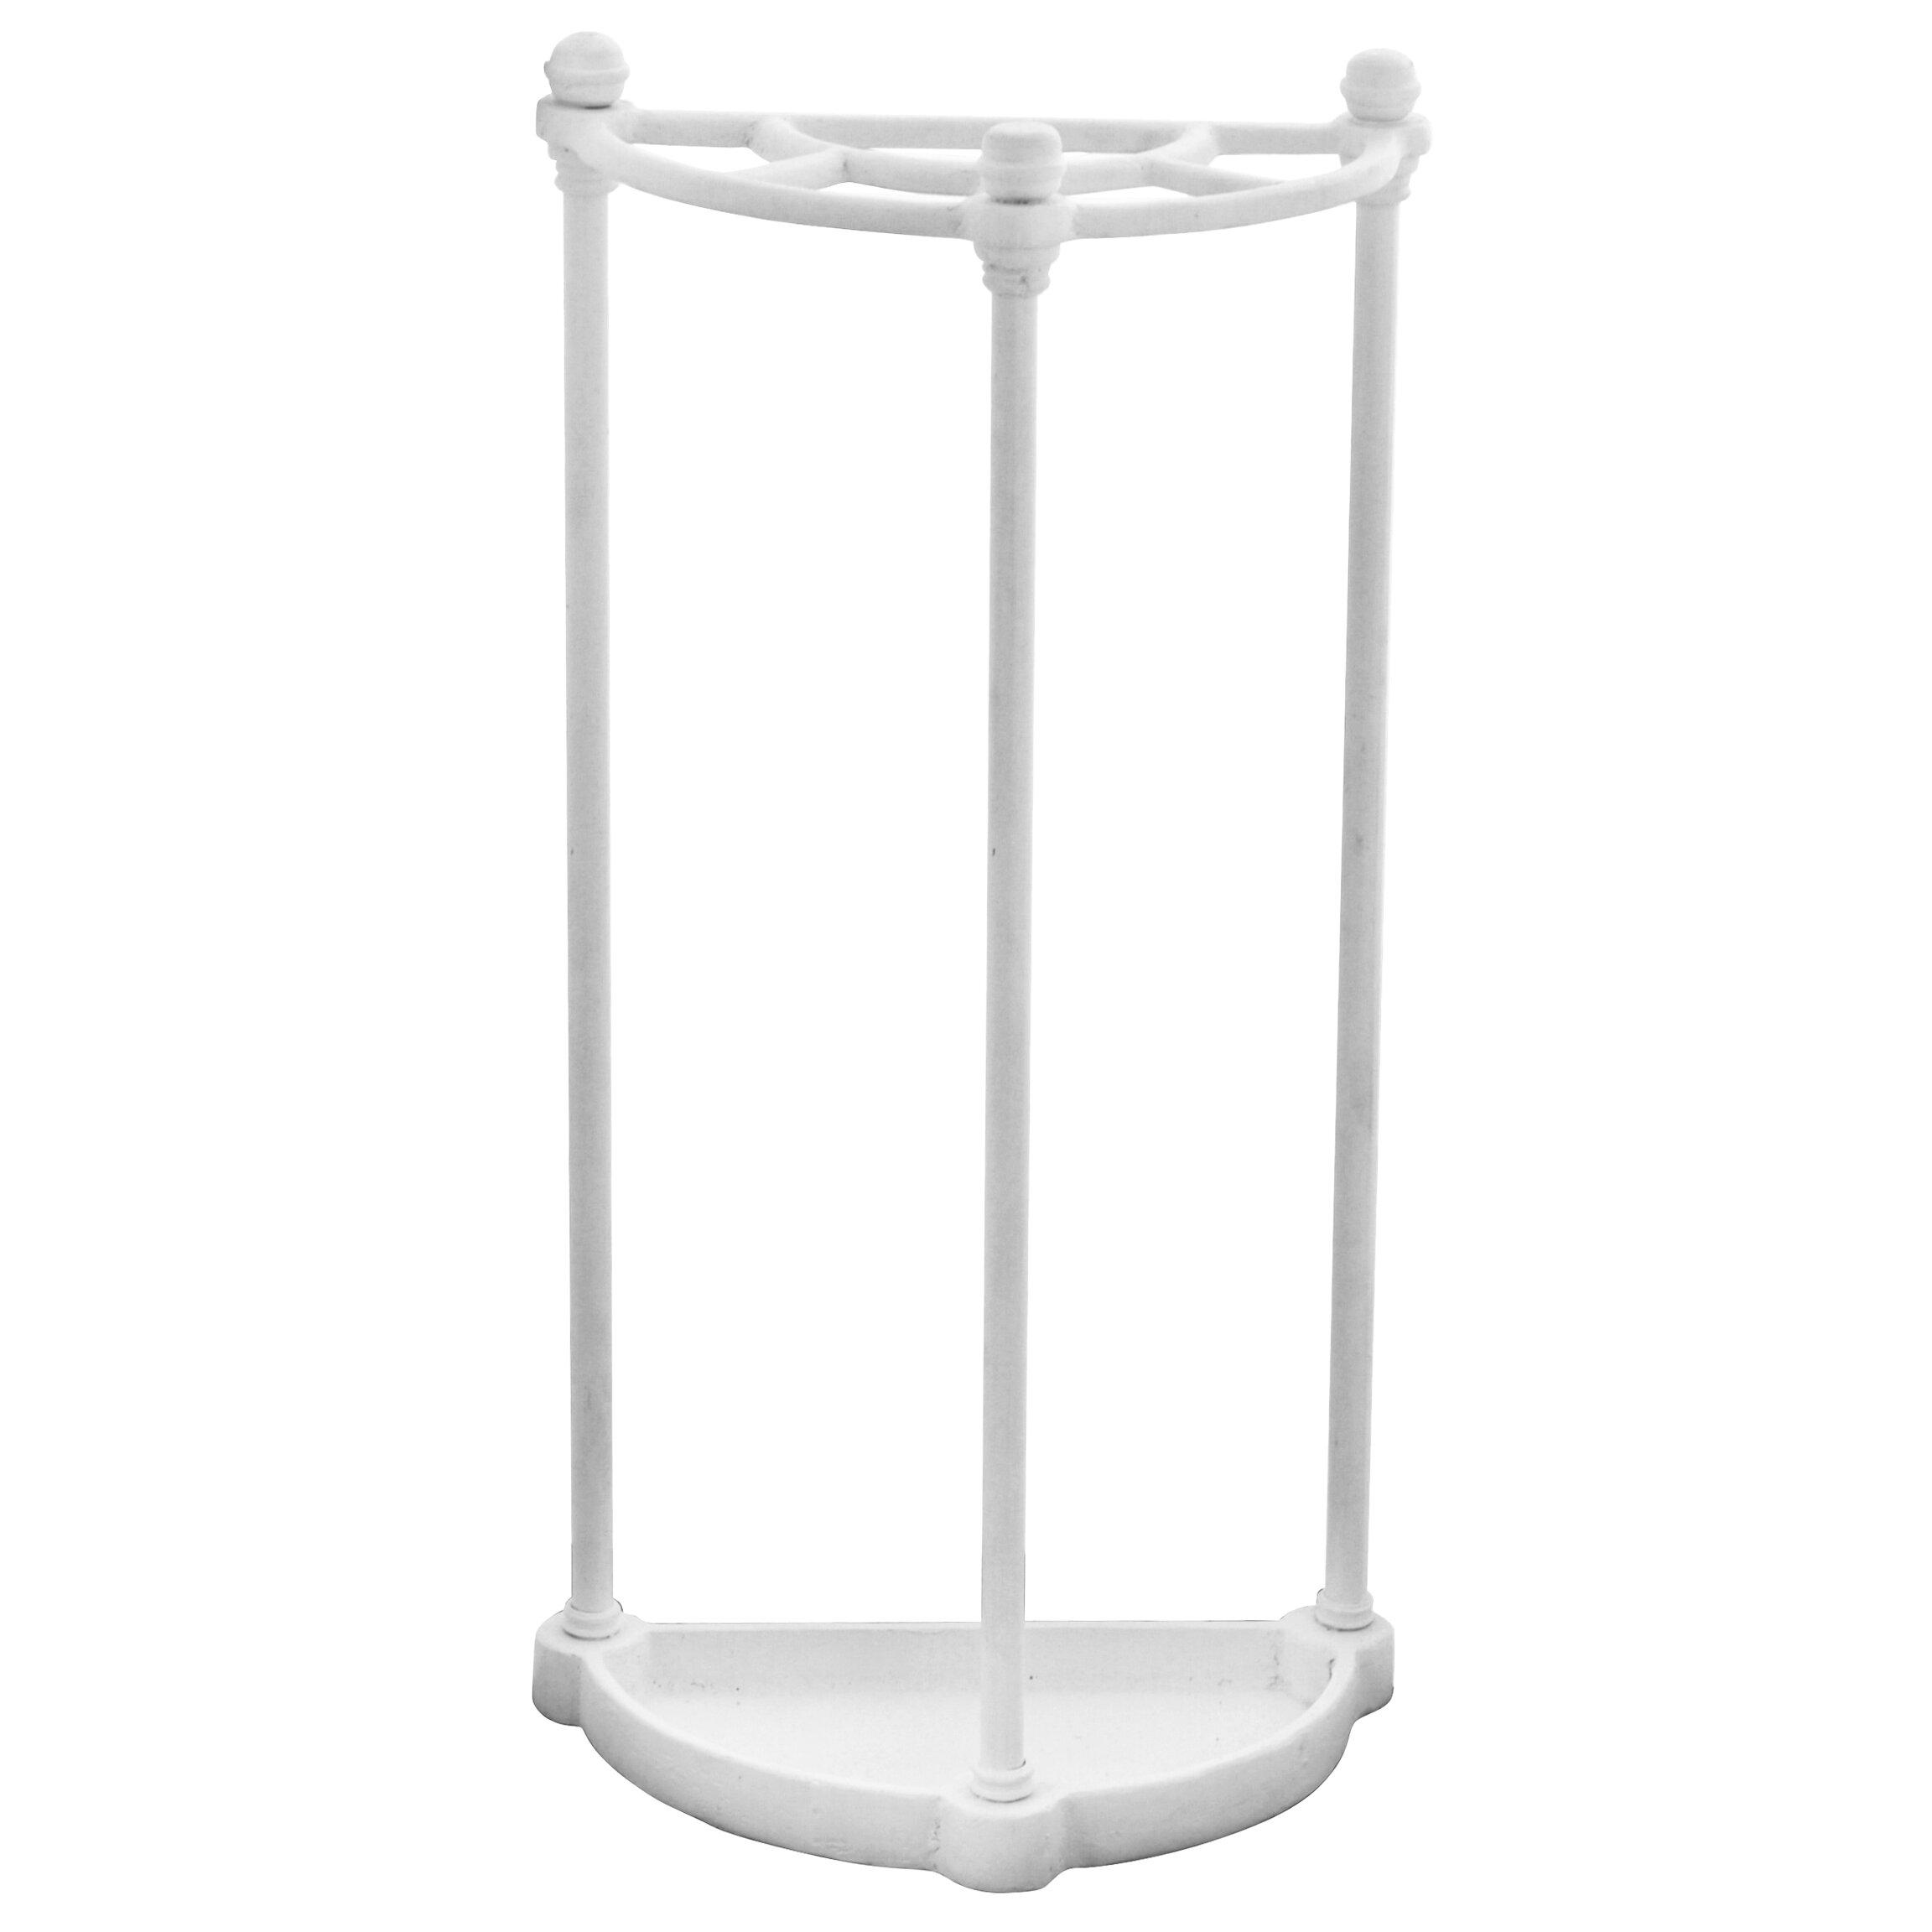 Umbrella Stand Wayfair: BIDKhome Umbrella Stand